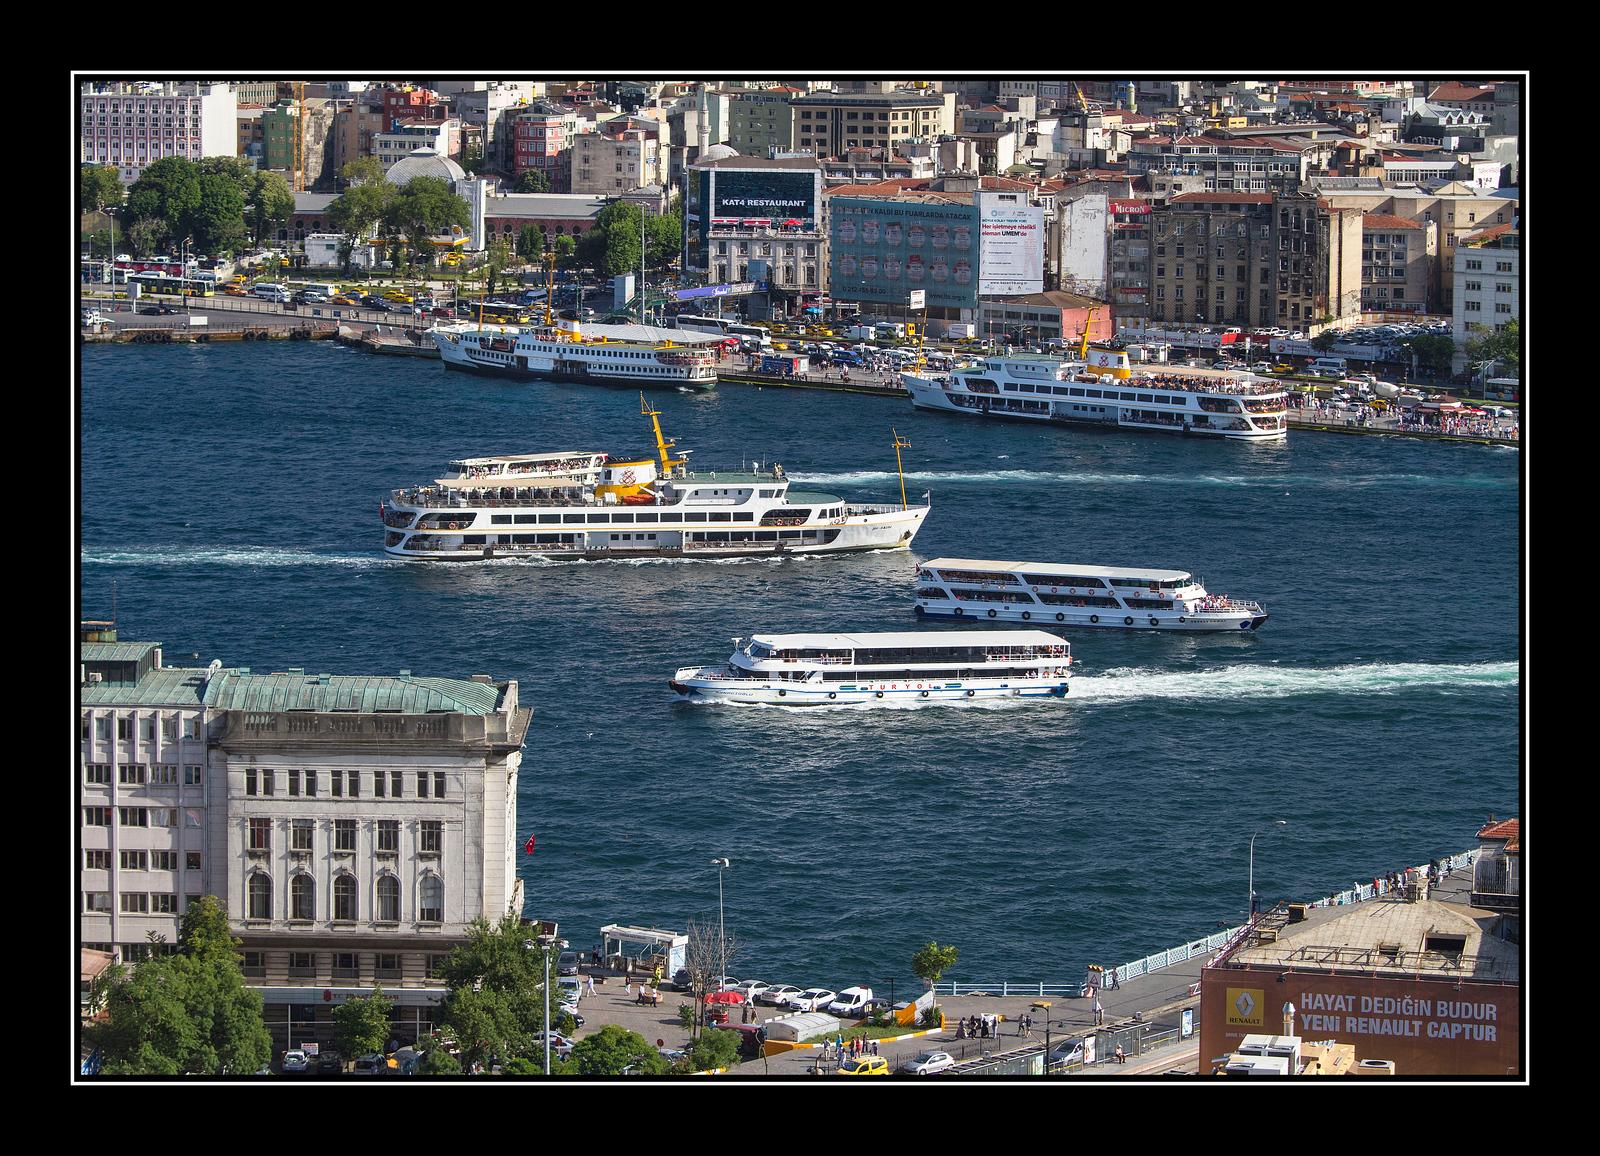 IMAGE: https://photos.smugmug.com/Travel/Istanbul/i-HXqzGvq/0/e61ebb62/X3/Golden%20Horn%20Traffic%2002%20from%20Galata%20Tower-X3.jpg